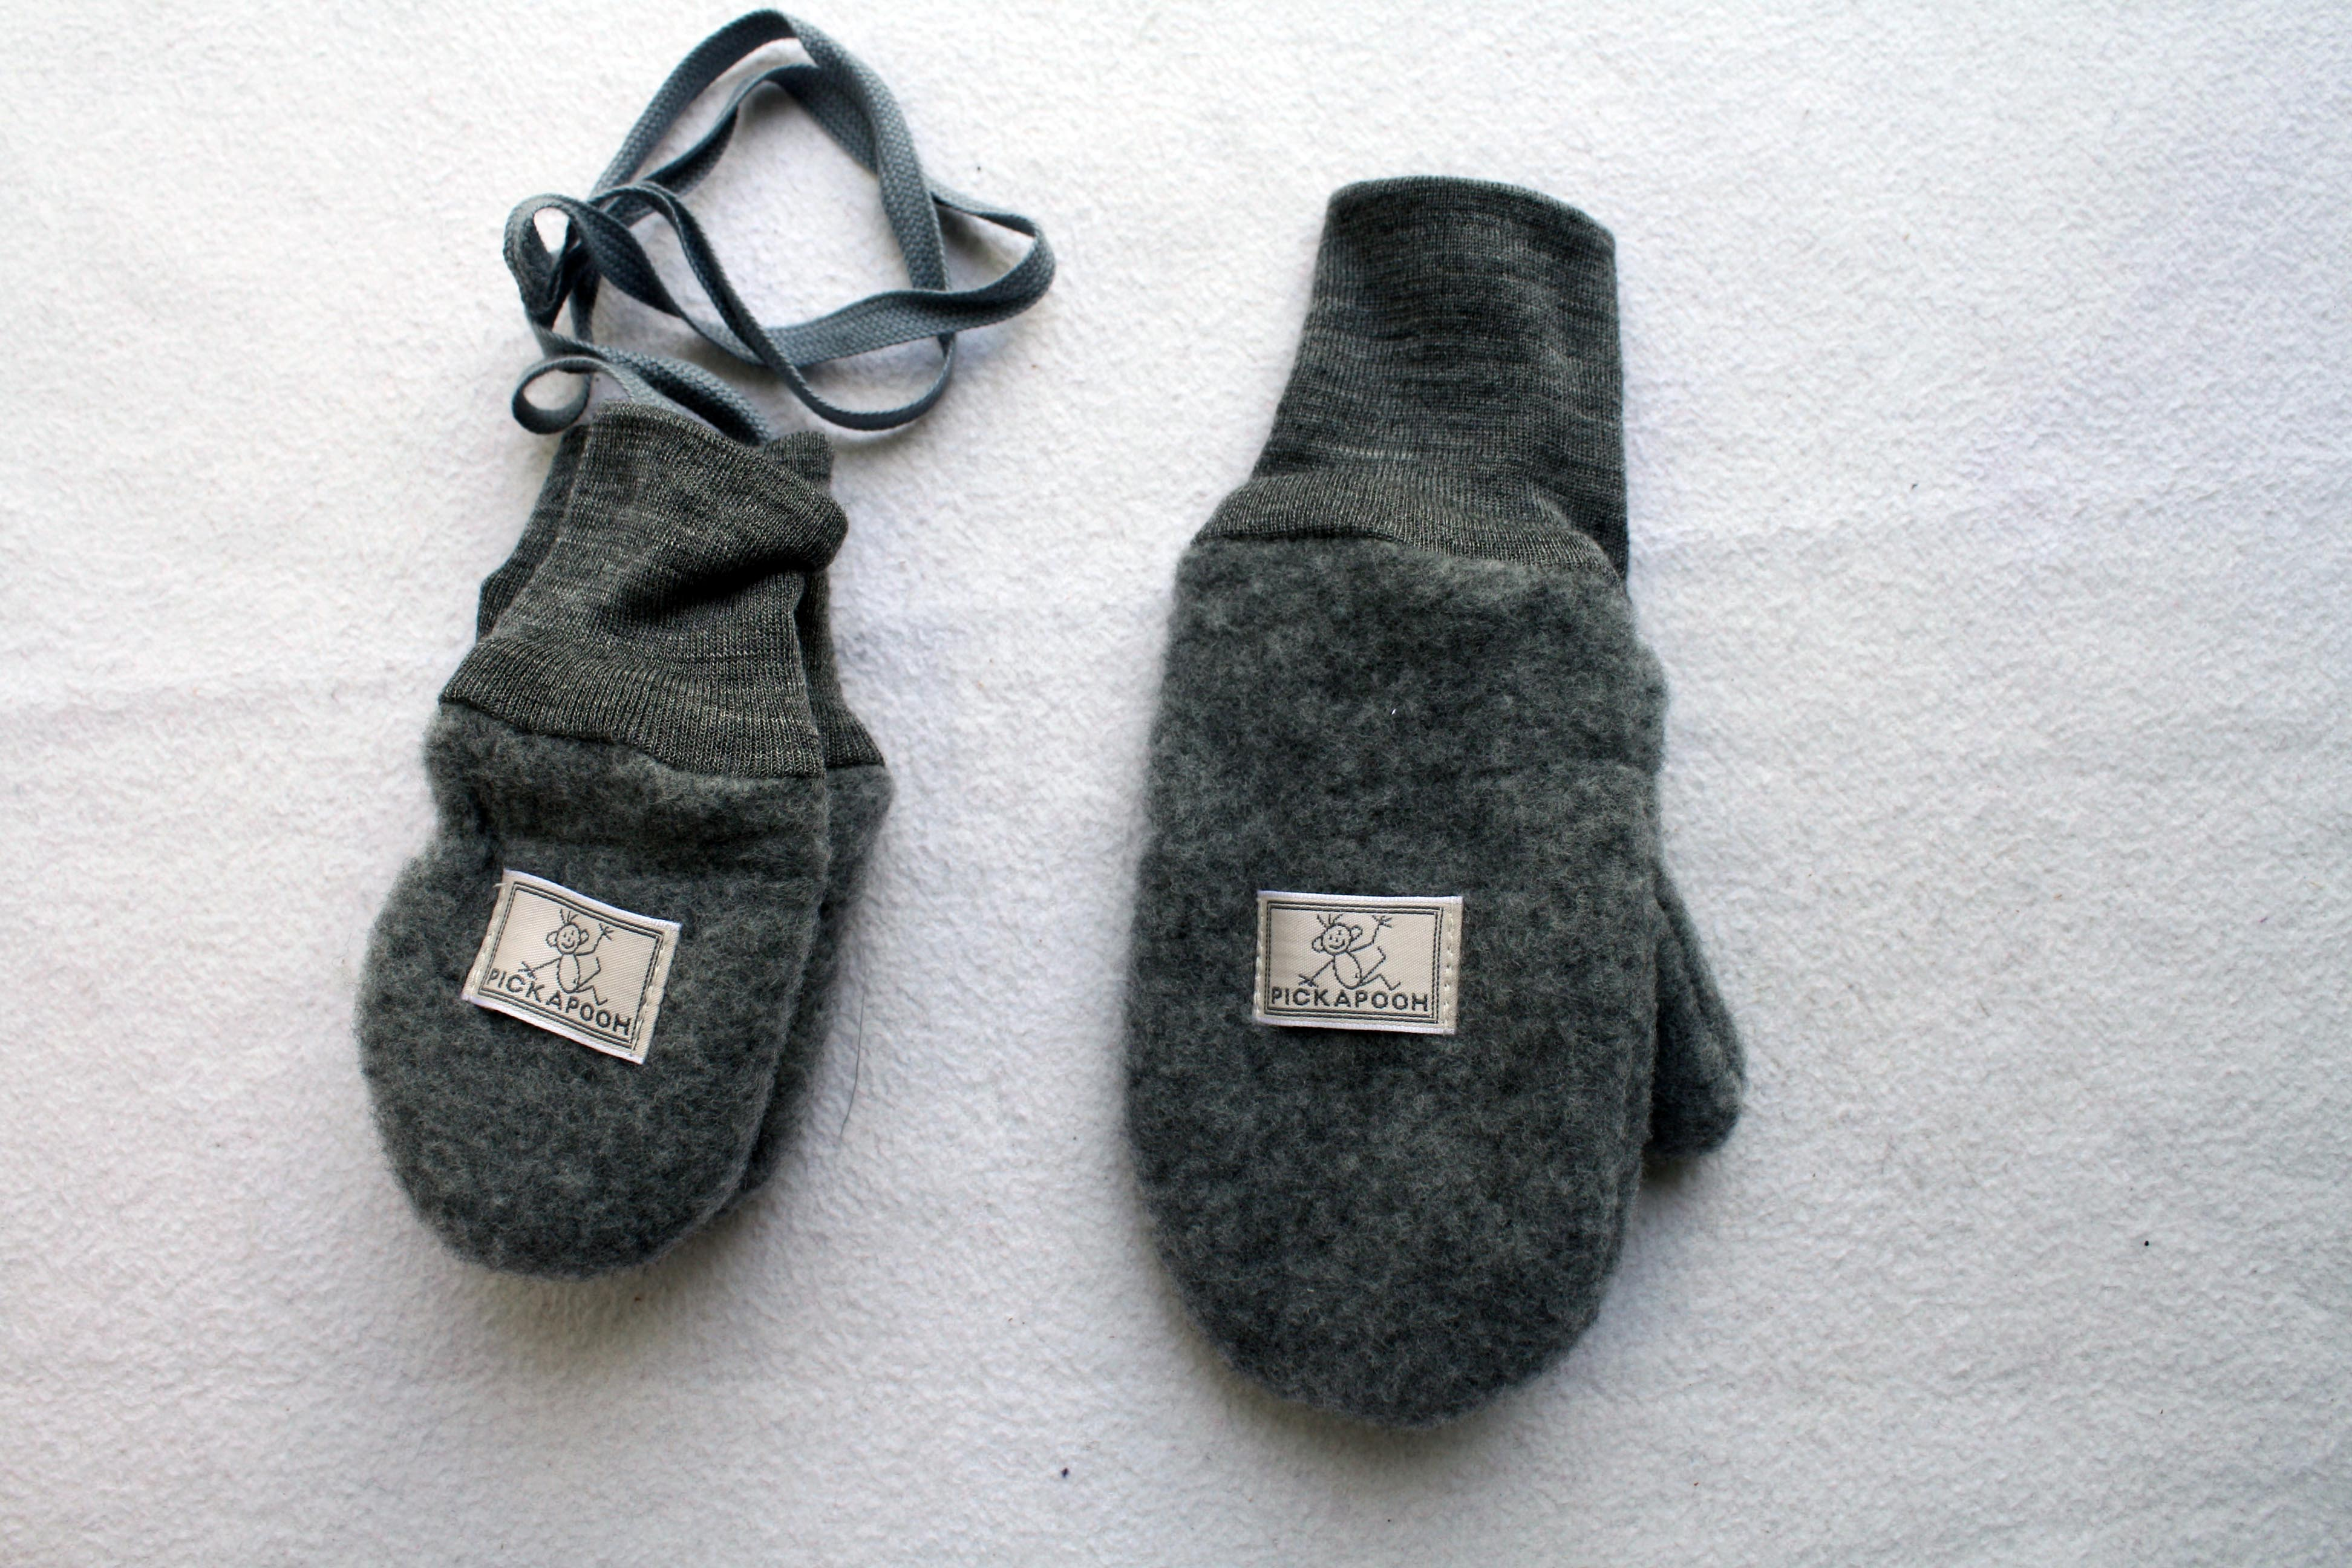 Pickapooh Handschuhe Fäustlinge Größe 1 Clothing, Shoes & Accessories